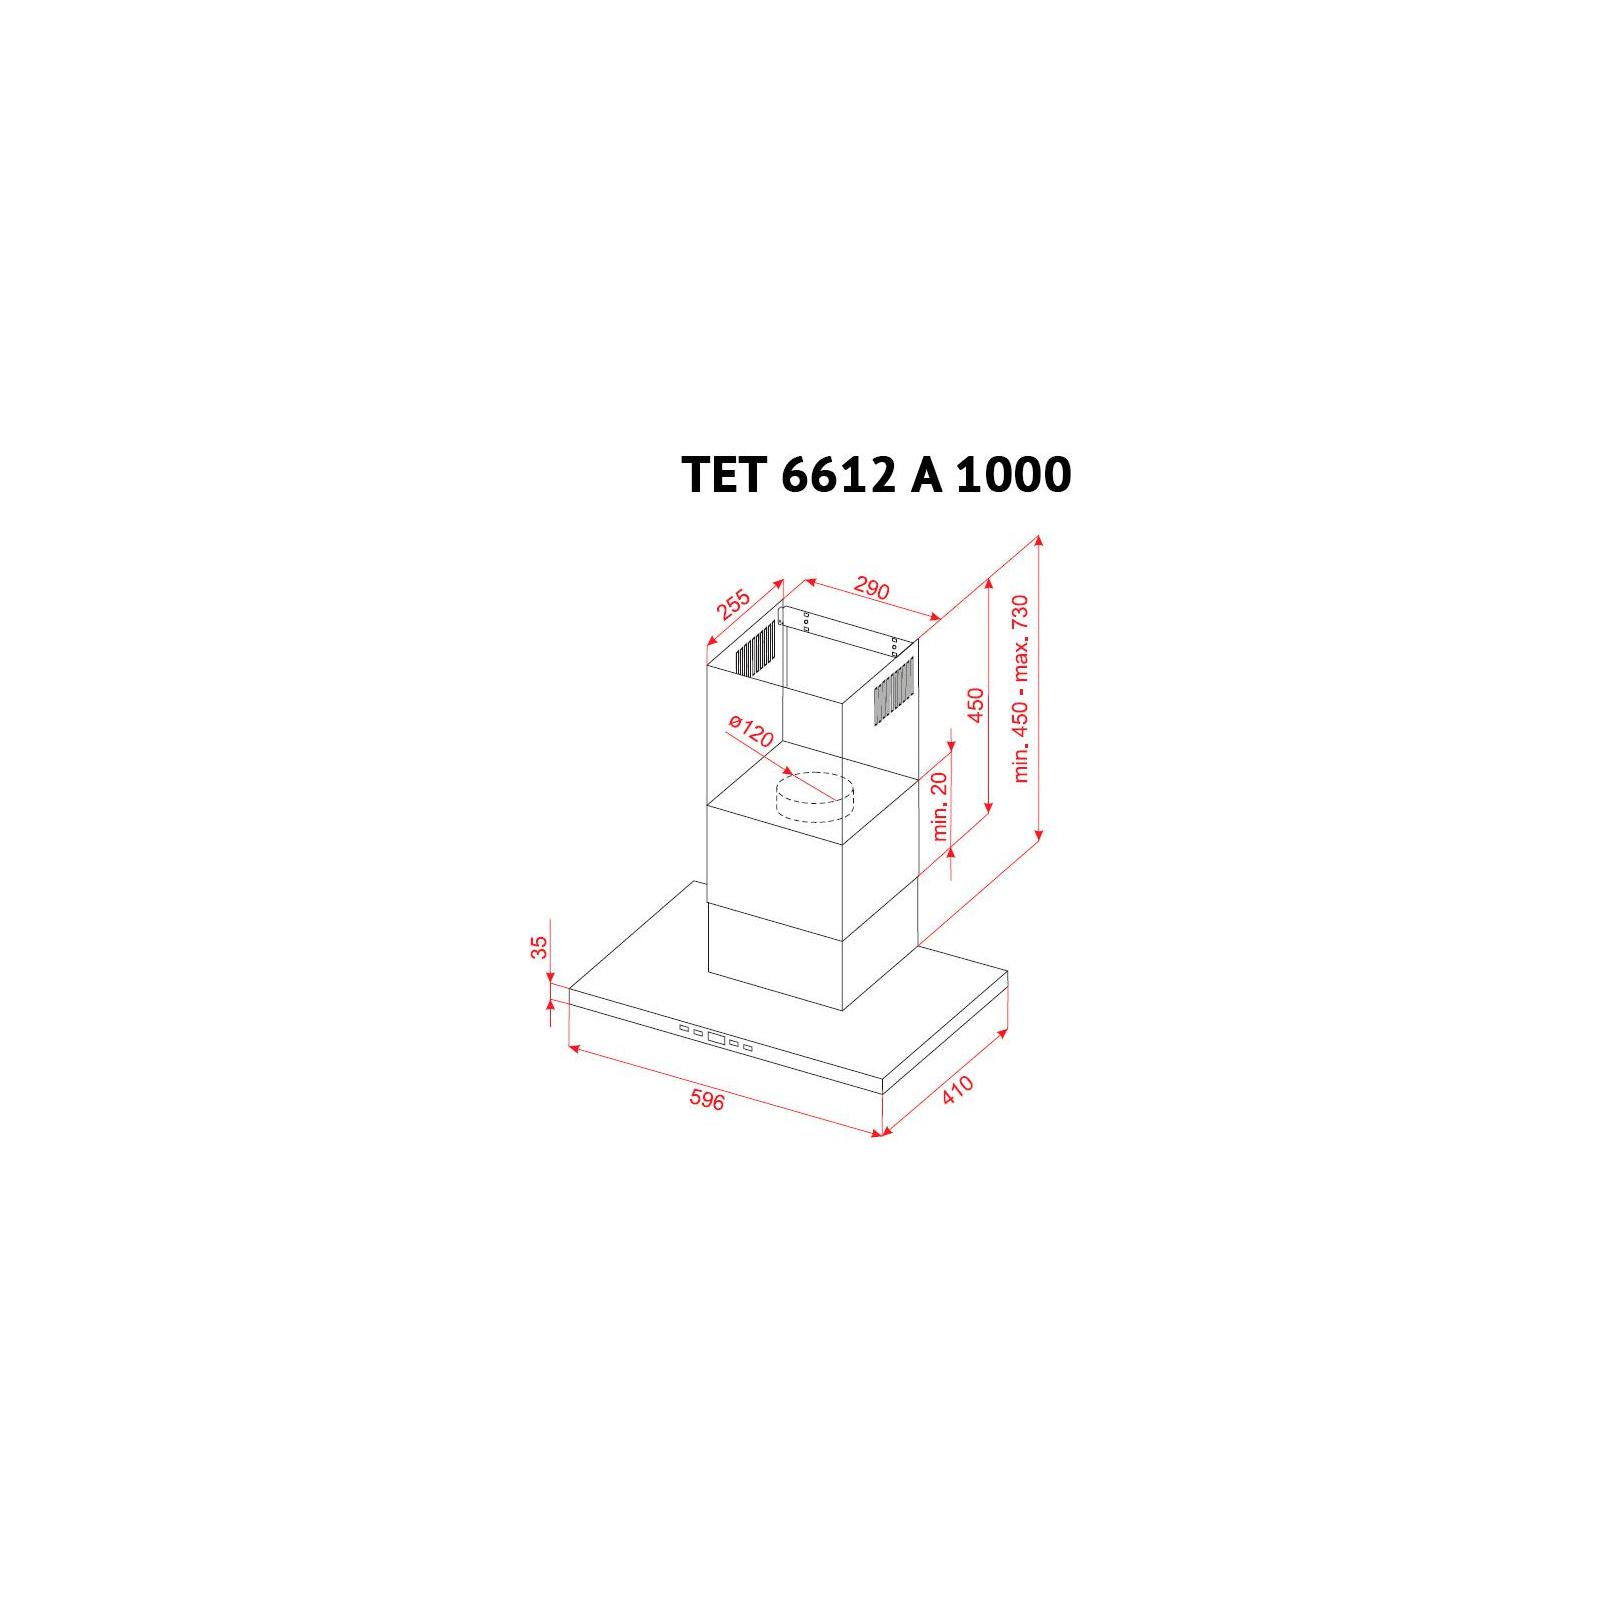 Вытяжка кухонная PERFELLI TET 6612 A 1000 I LED изображение 10